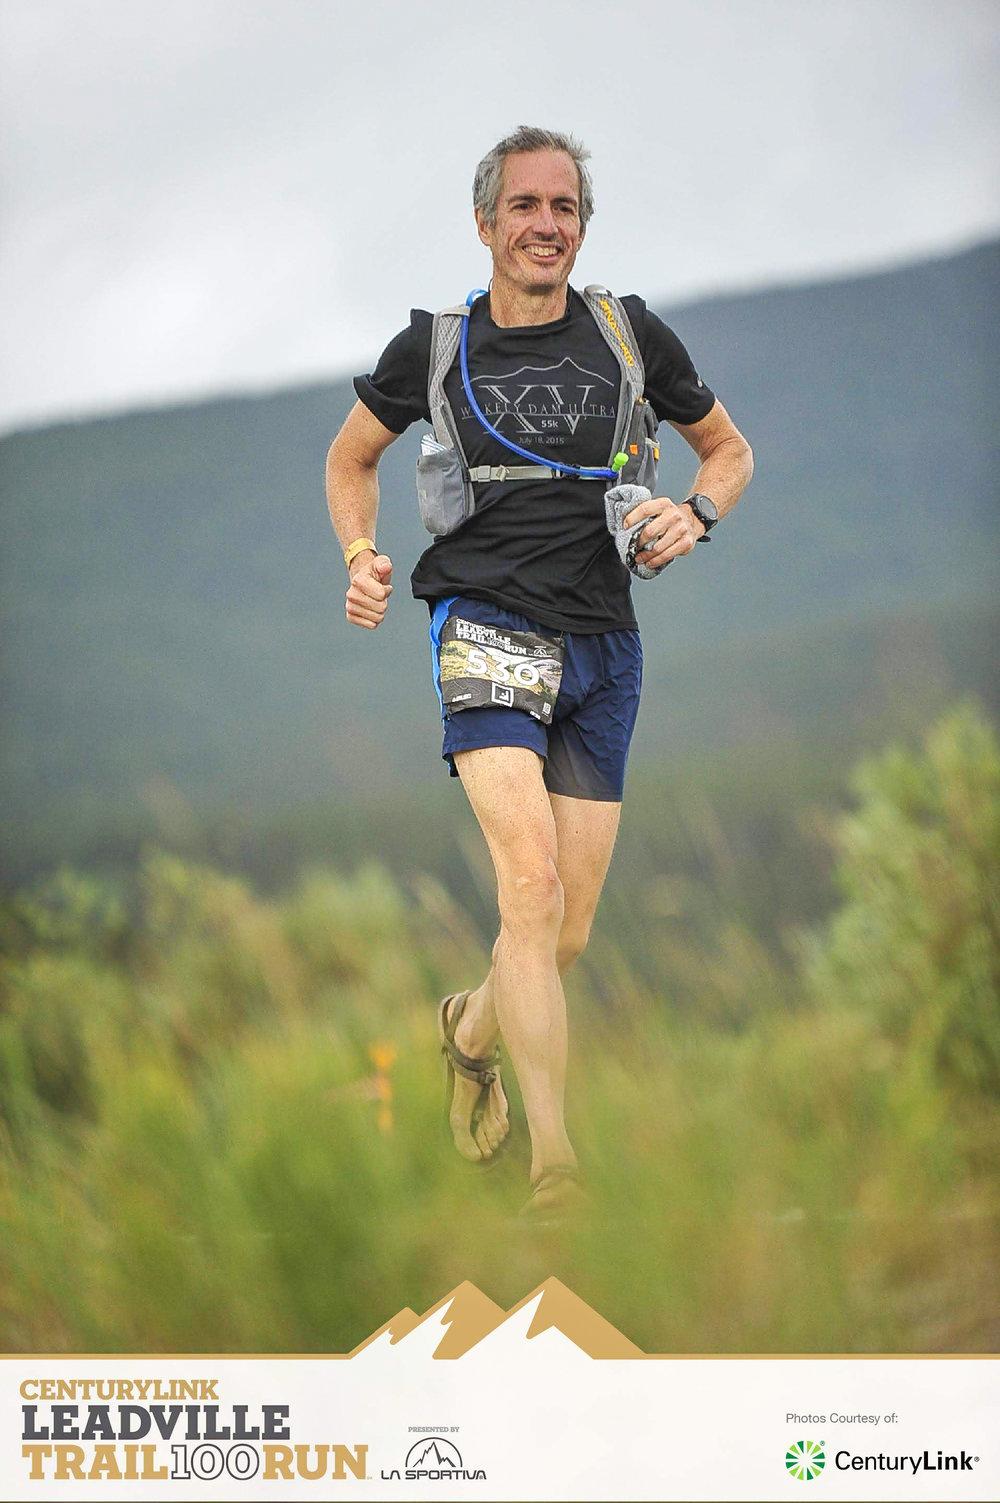 2018 Leadville Trail 100 Run.